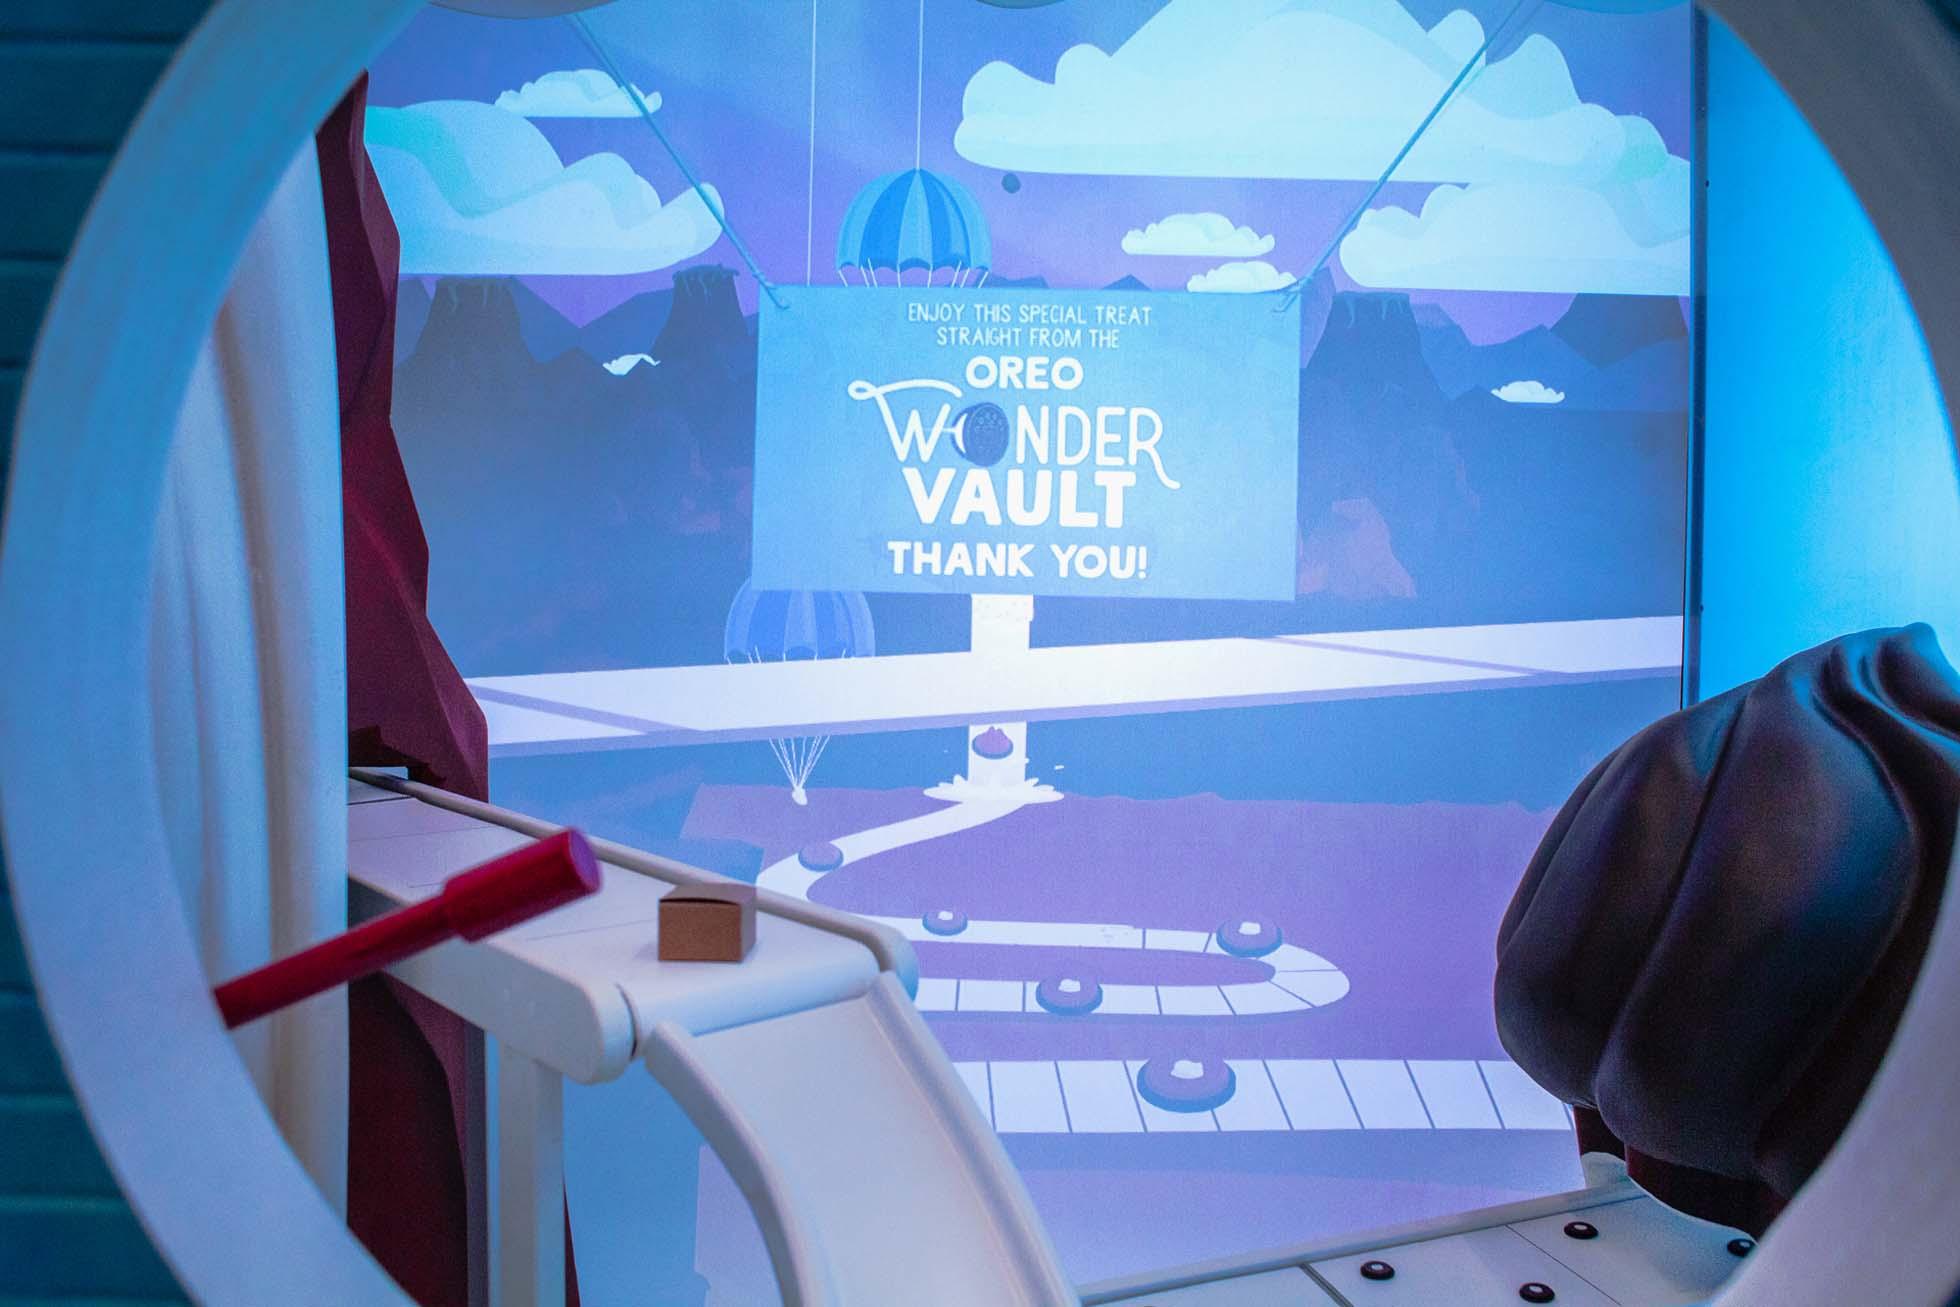 Iontank - Oreo Wonder Vault